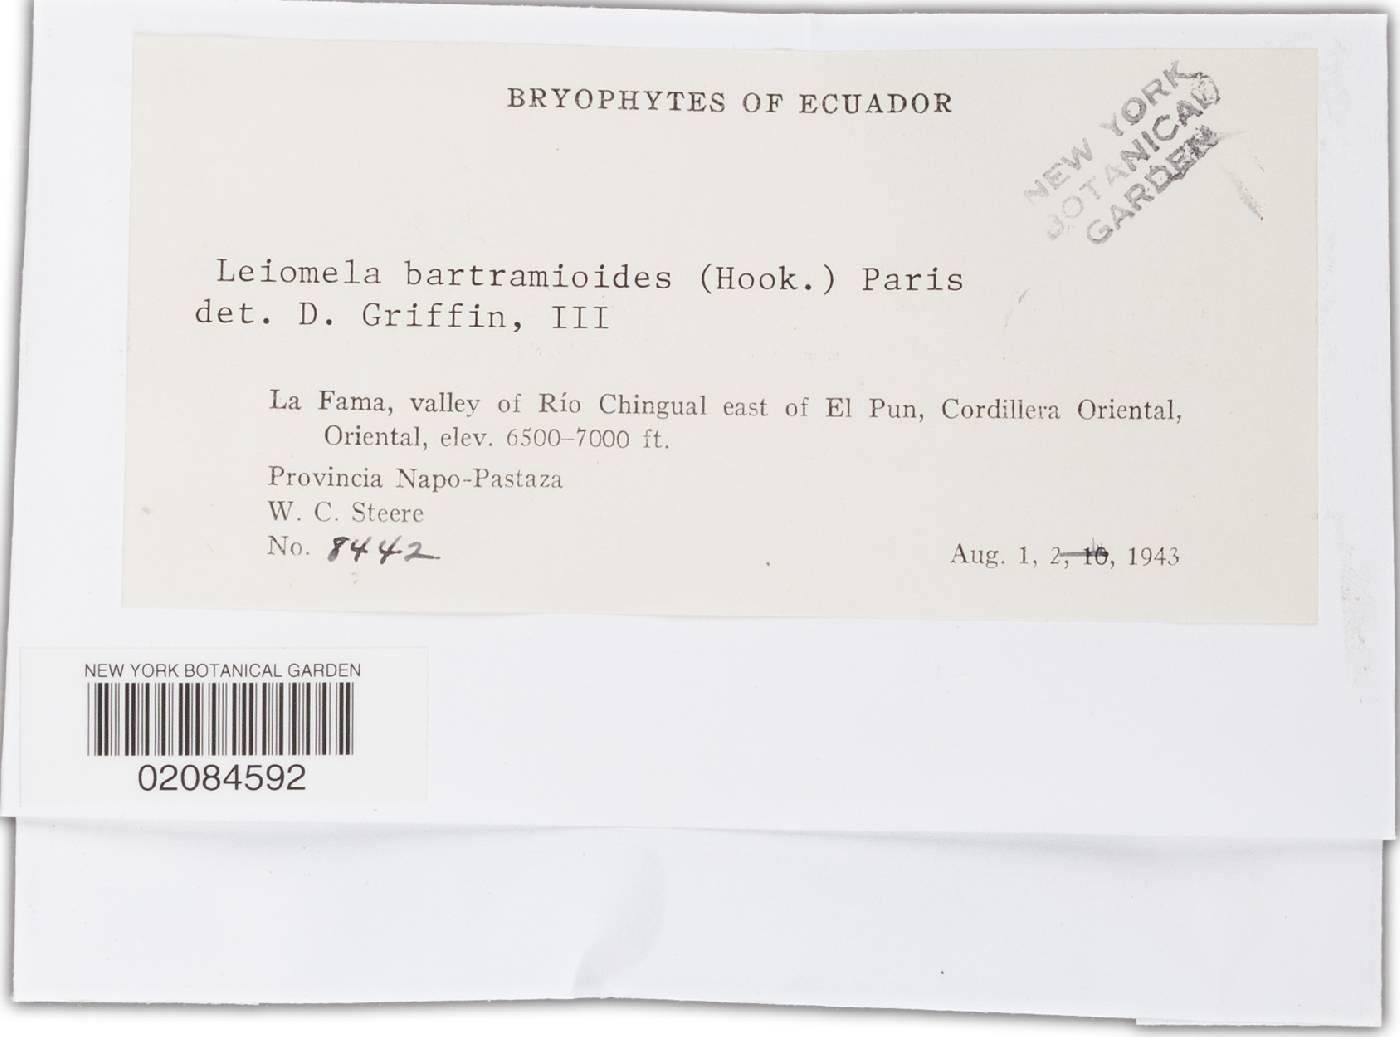 Leiomela bartramioides image